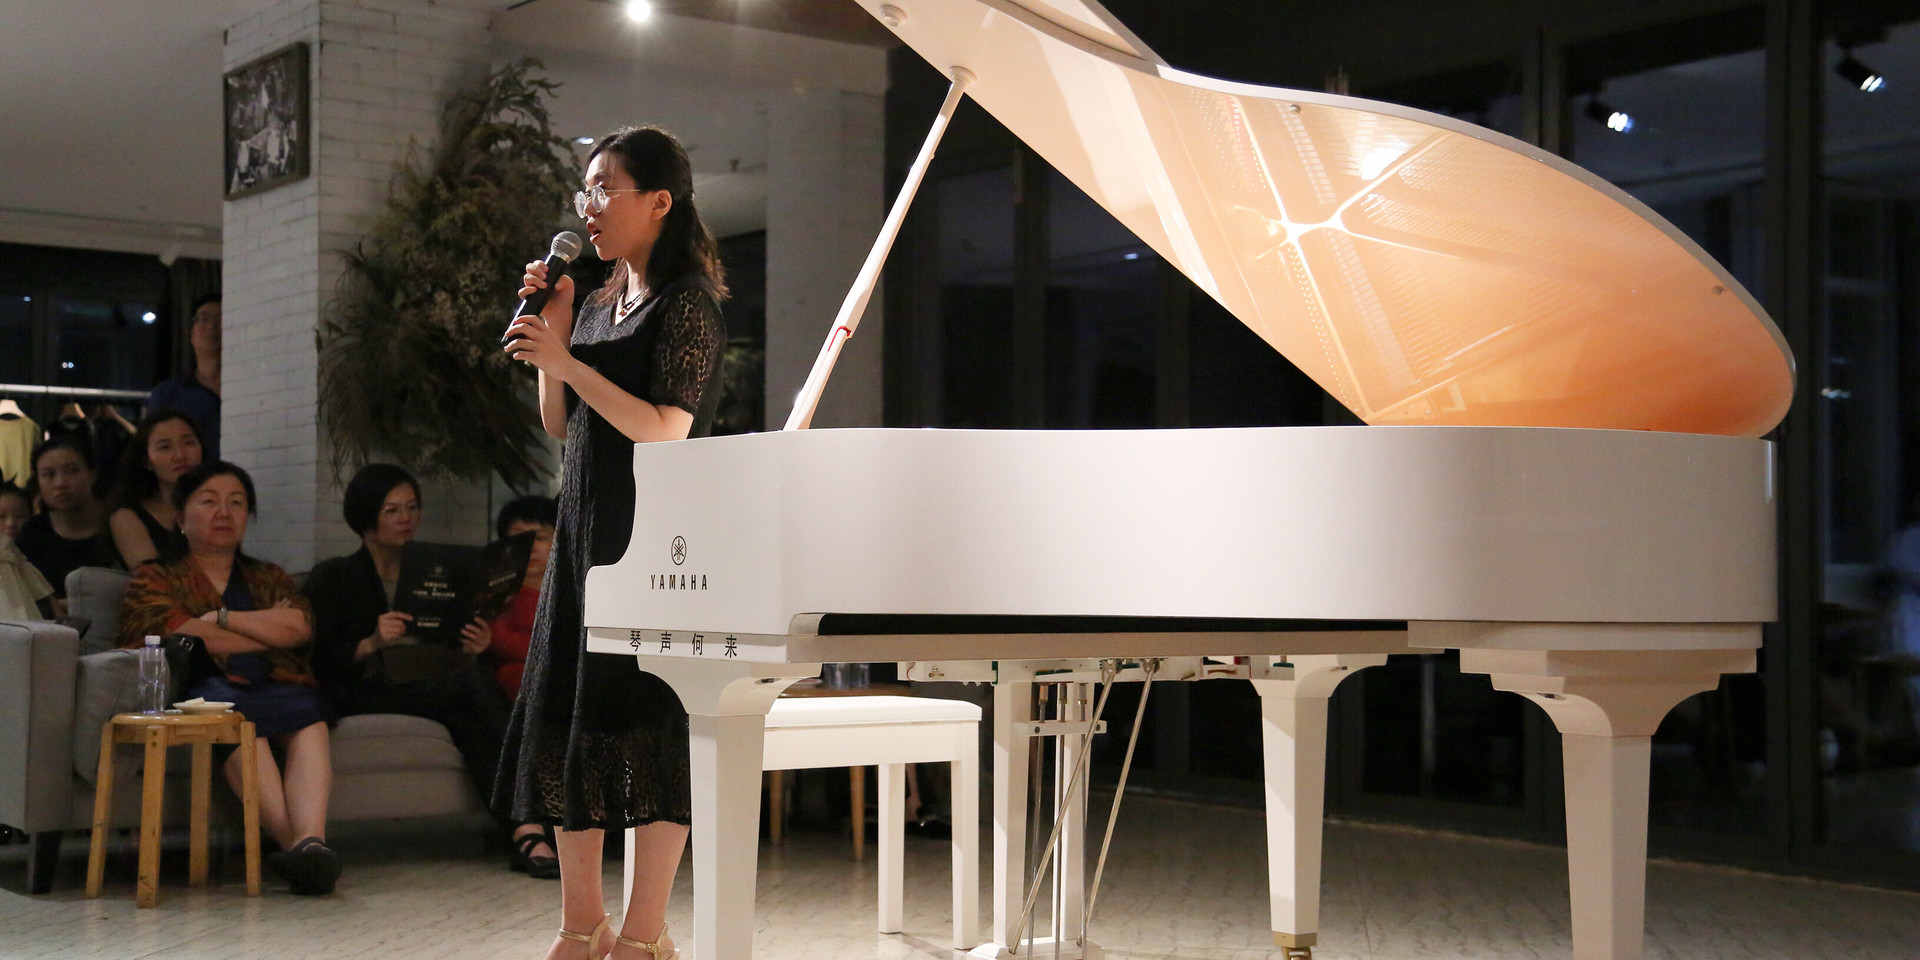 Anran Qian, Concert and Masterclass